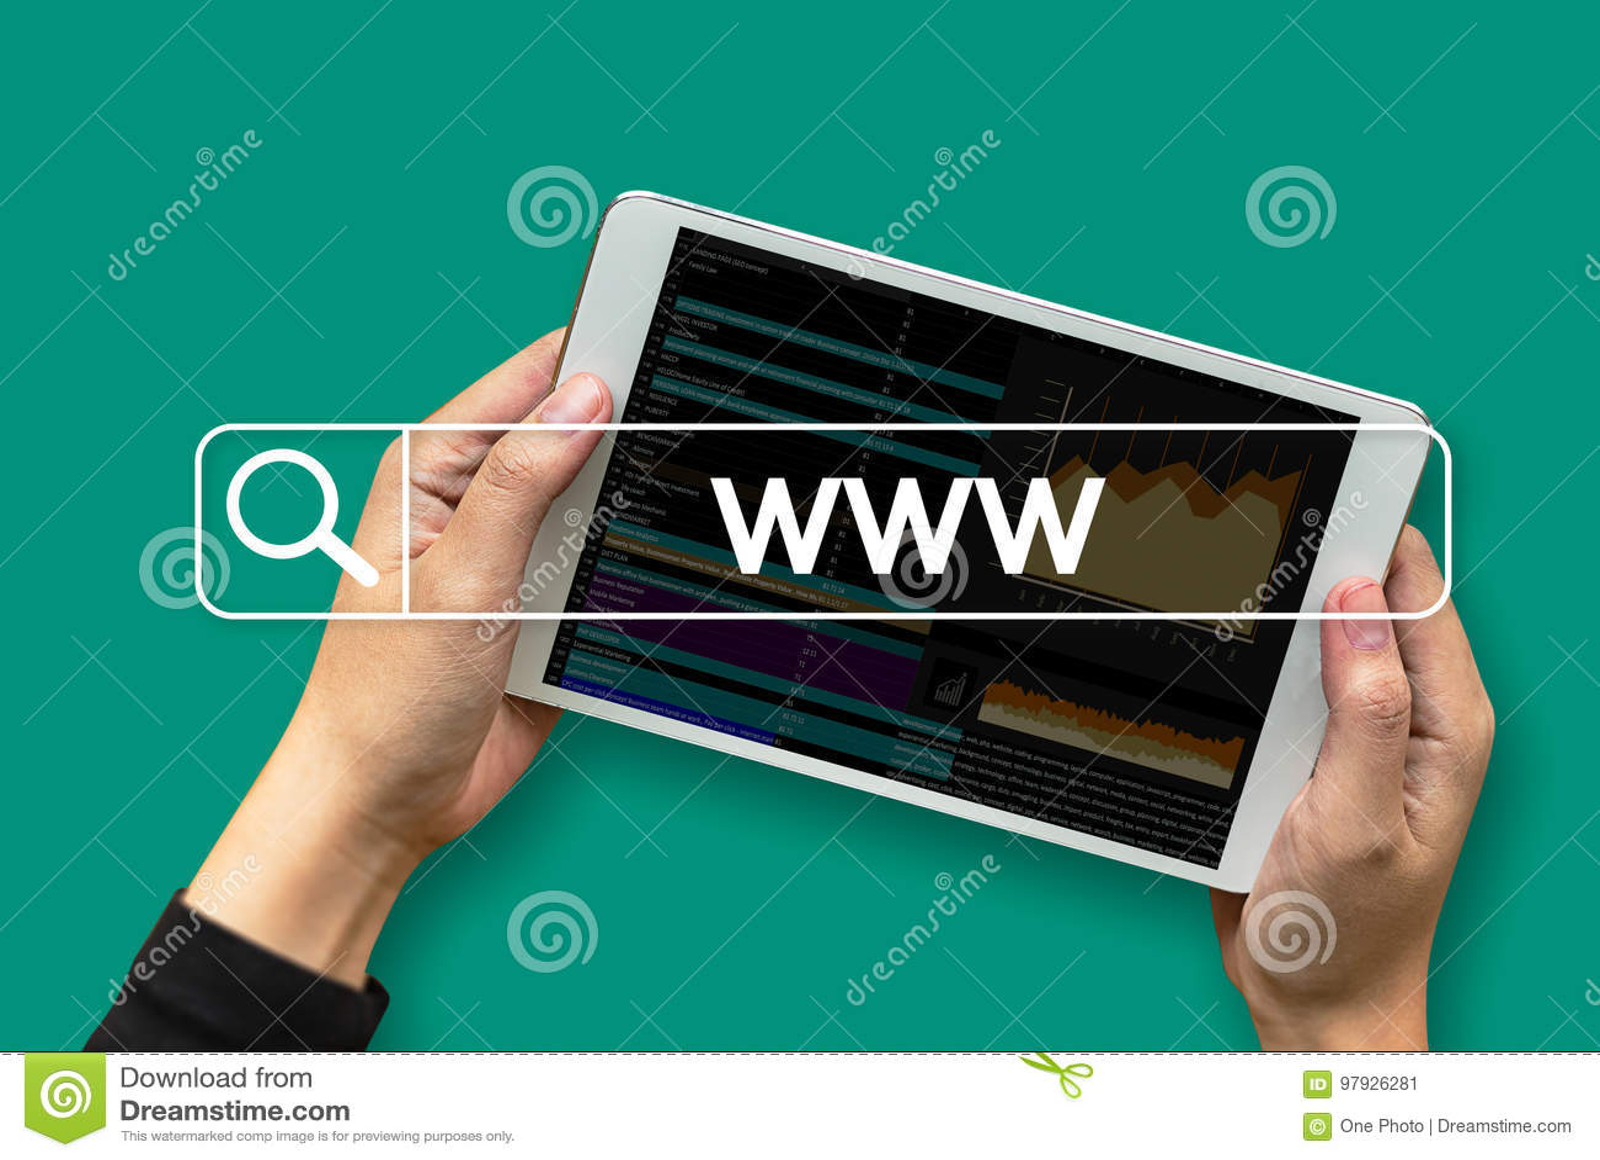 WWW Website Online Internet Web Page Computer Browser ...